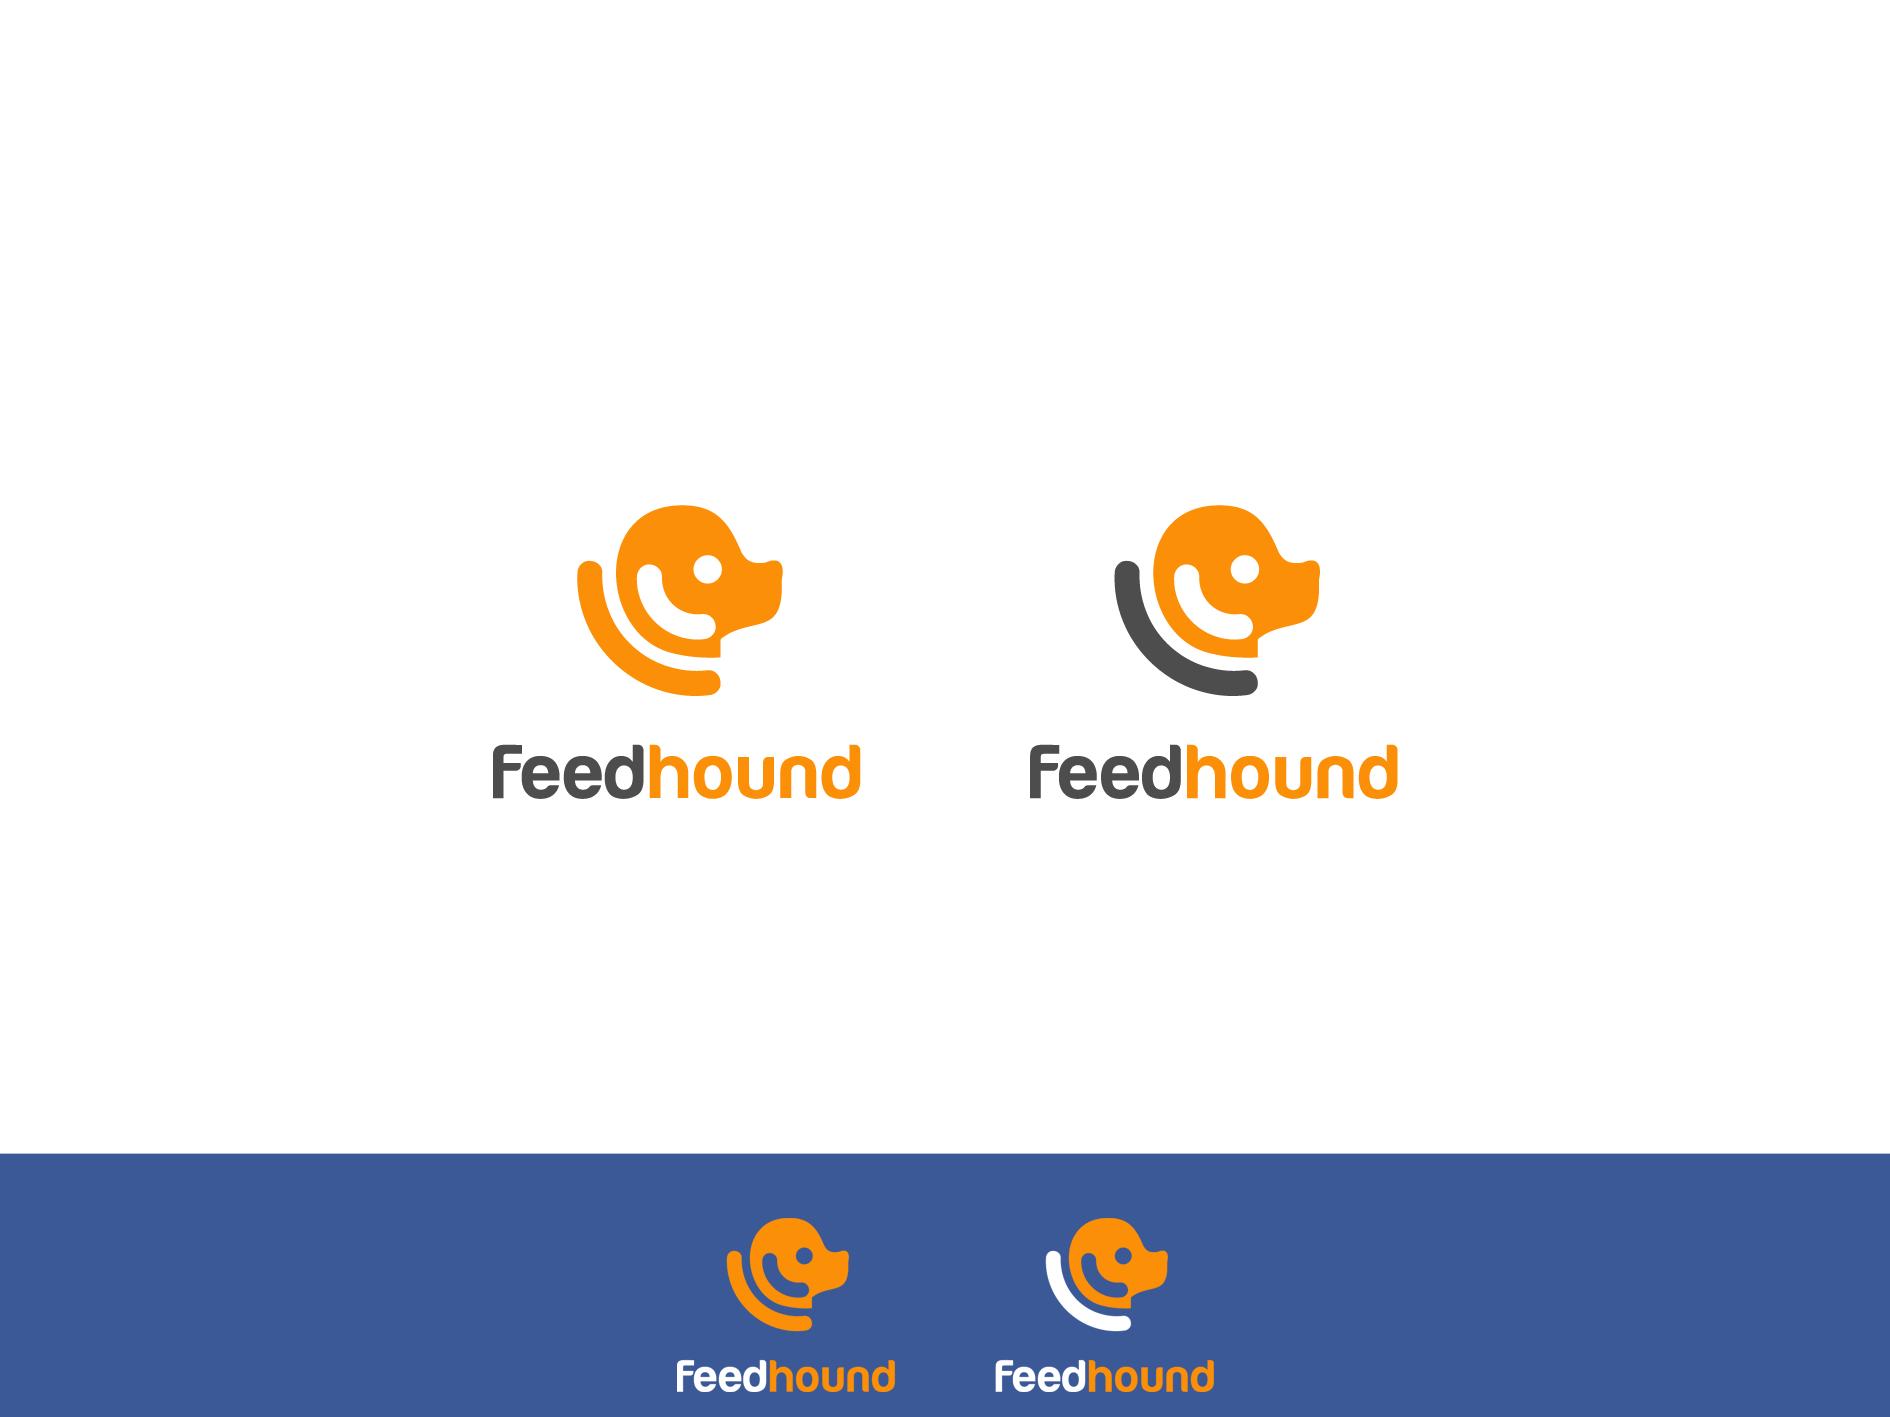 Feedhound needs a new logo